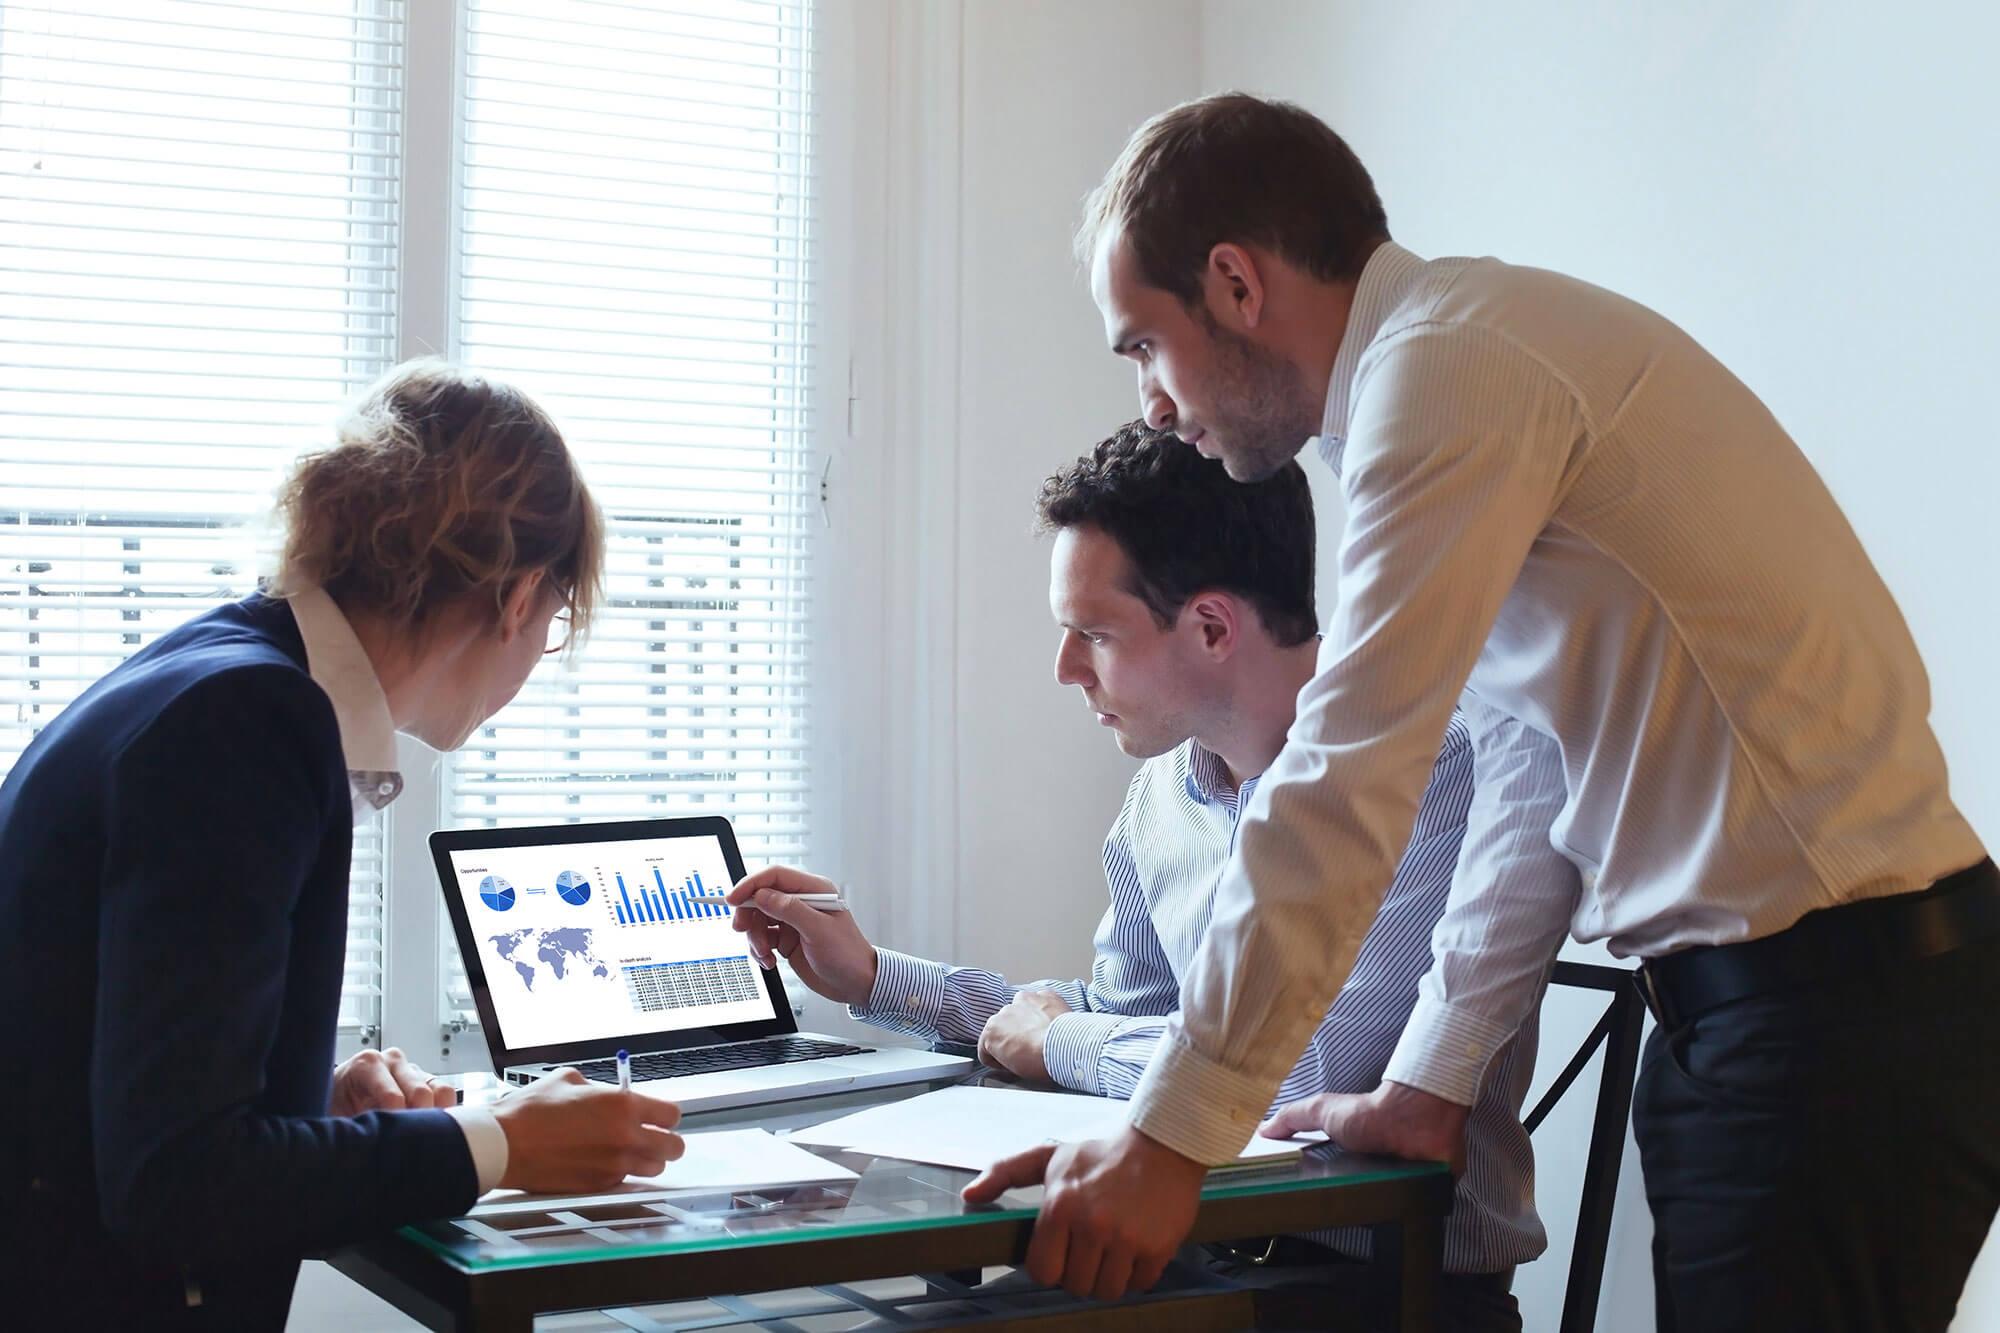 group-looking-at-computer